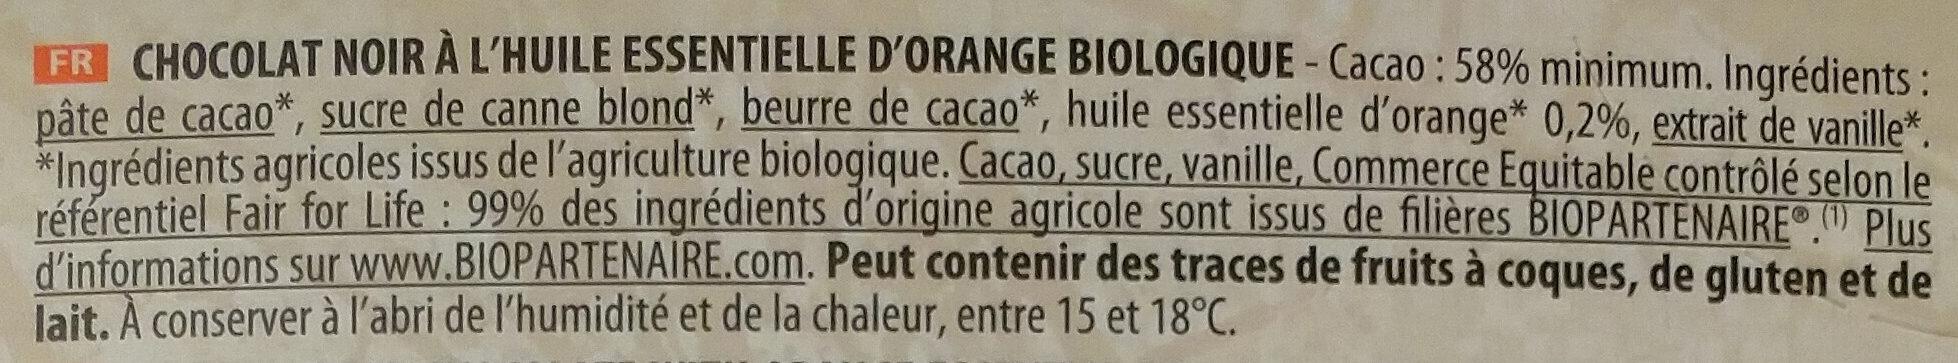 Chocolat noir huile essentielle orange - Ingredients